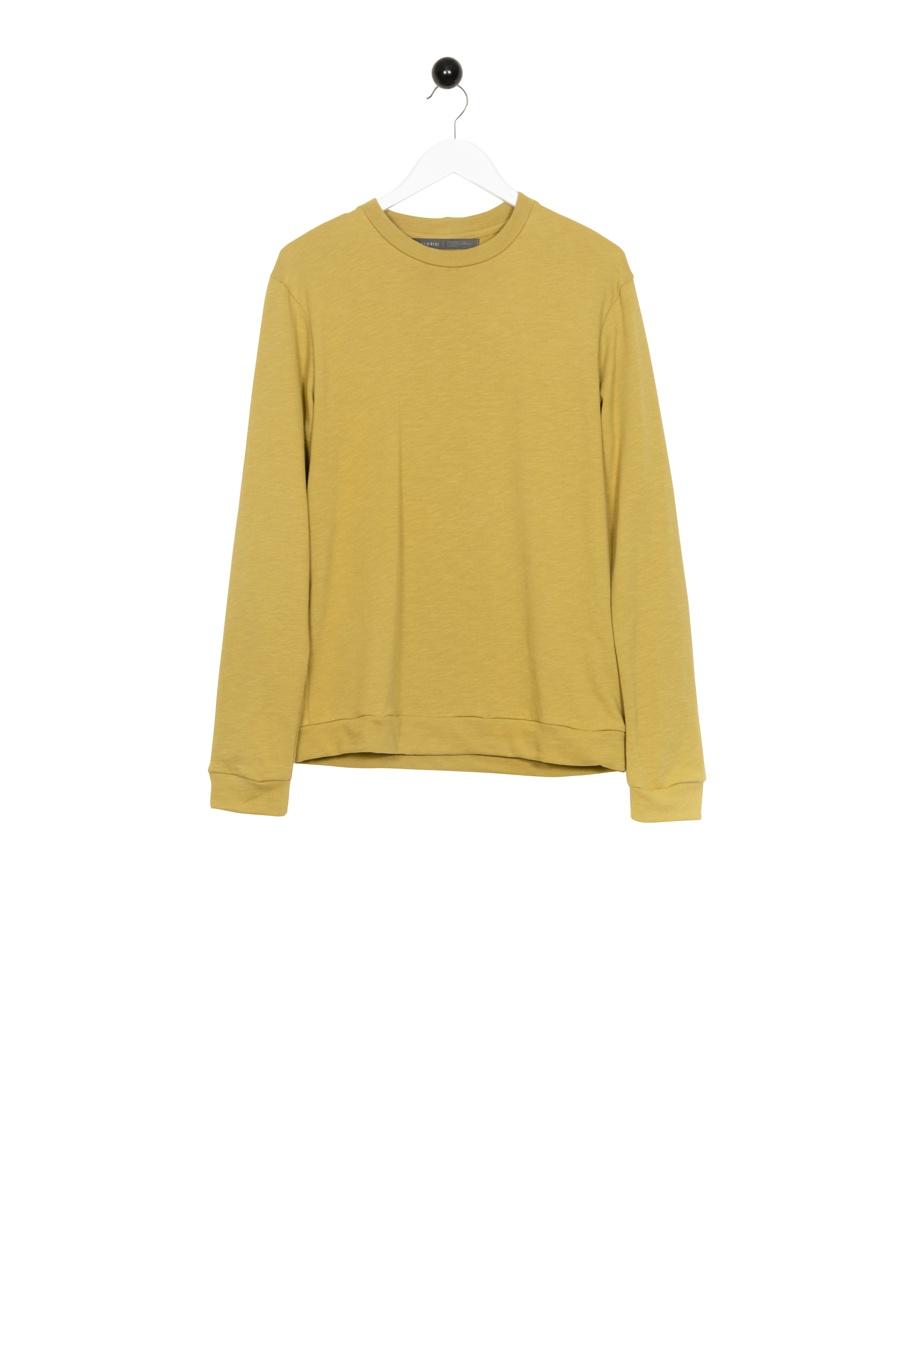 Örby Sweater